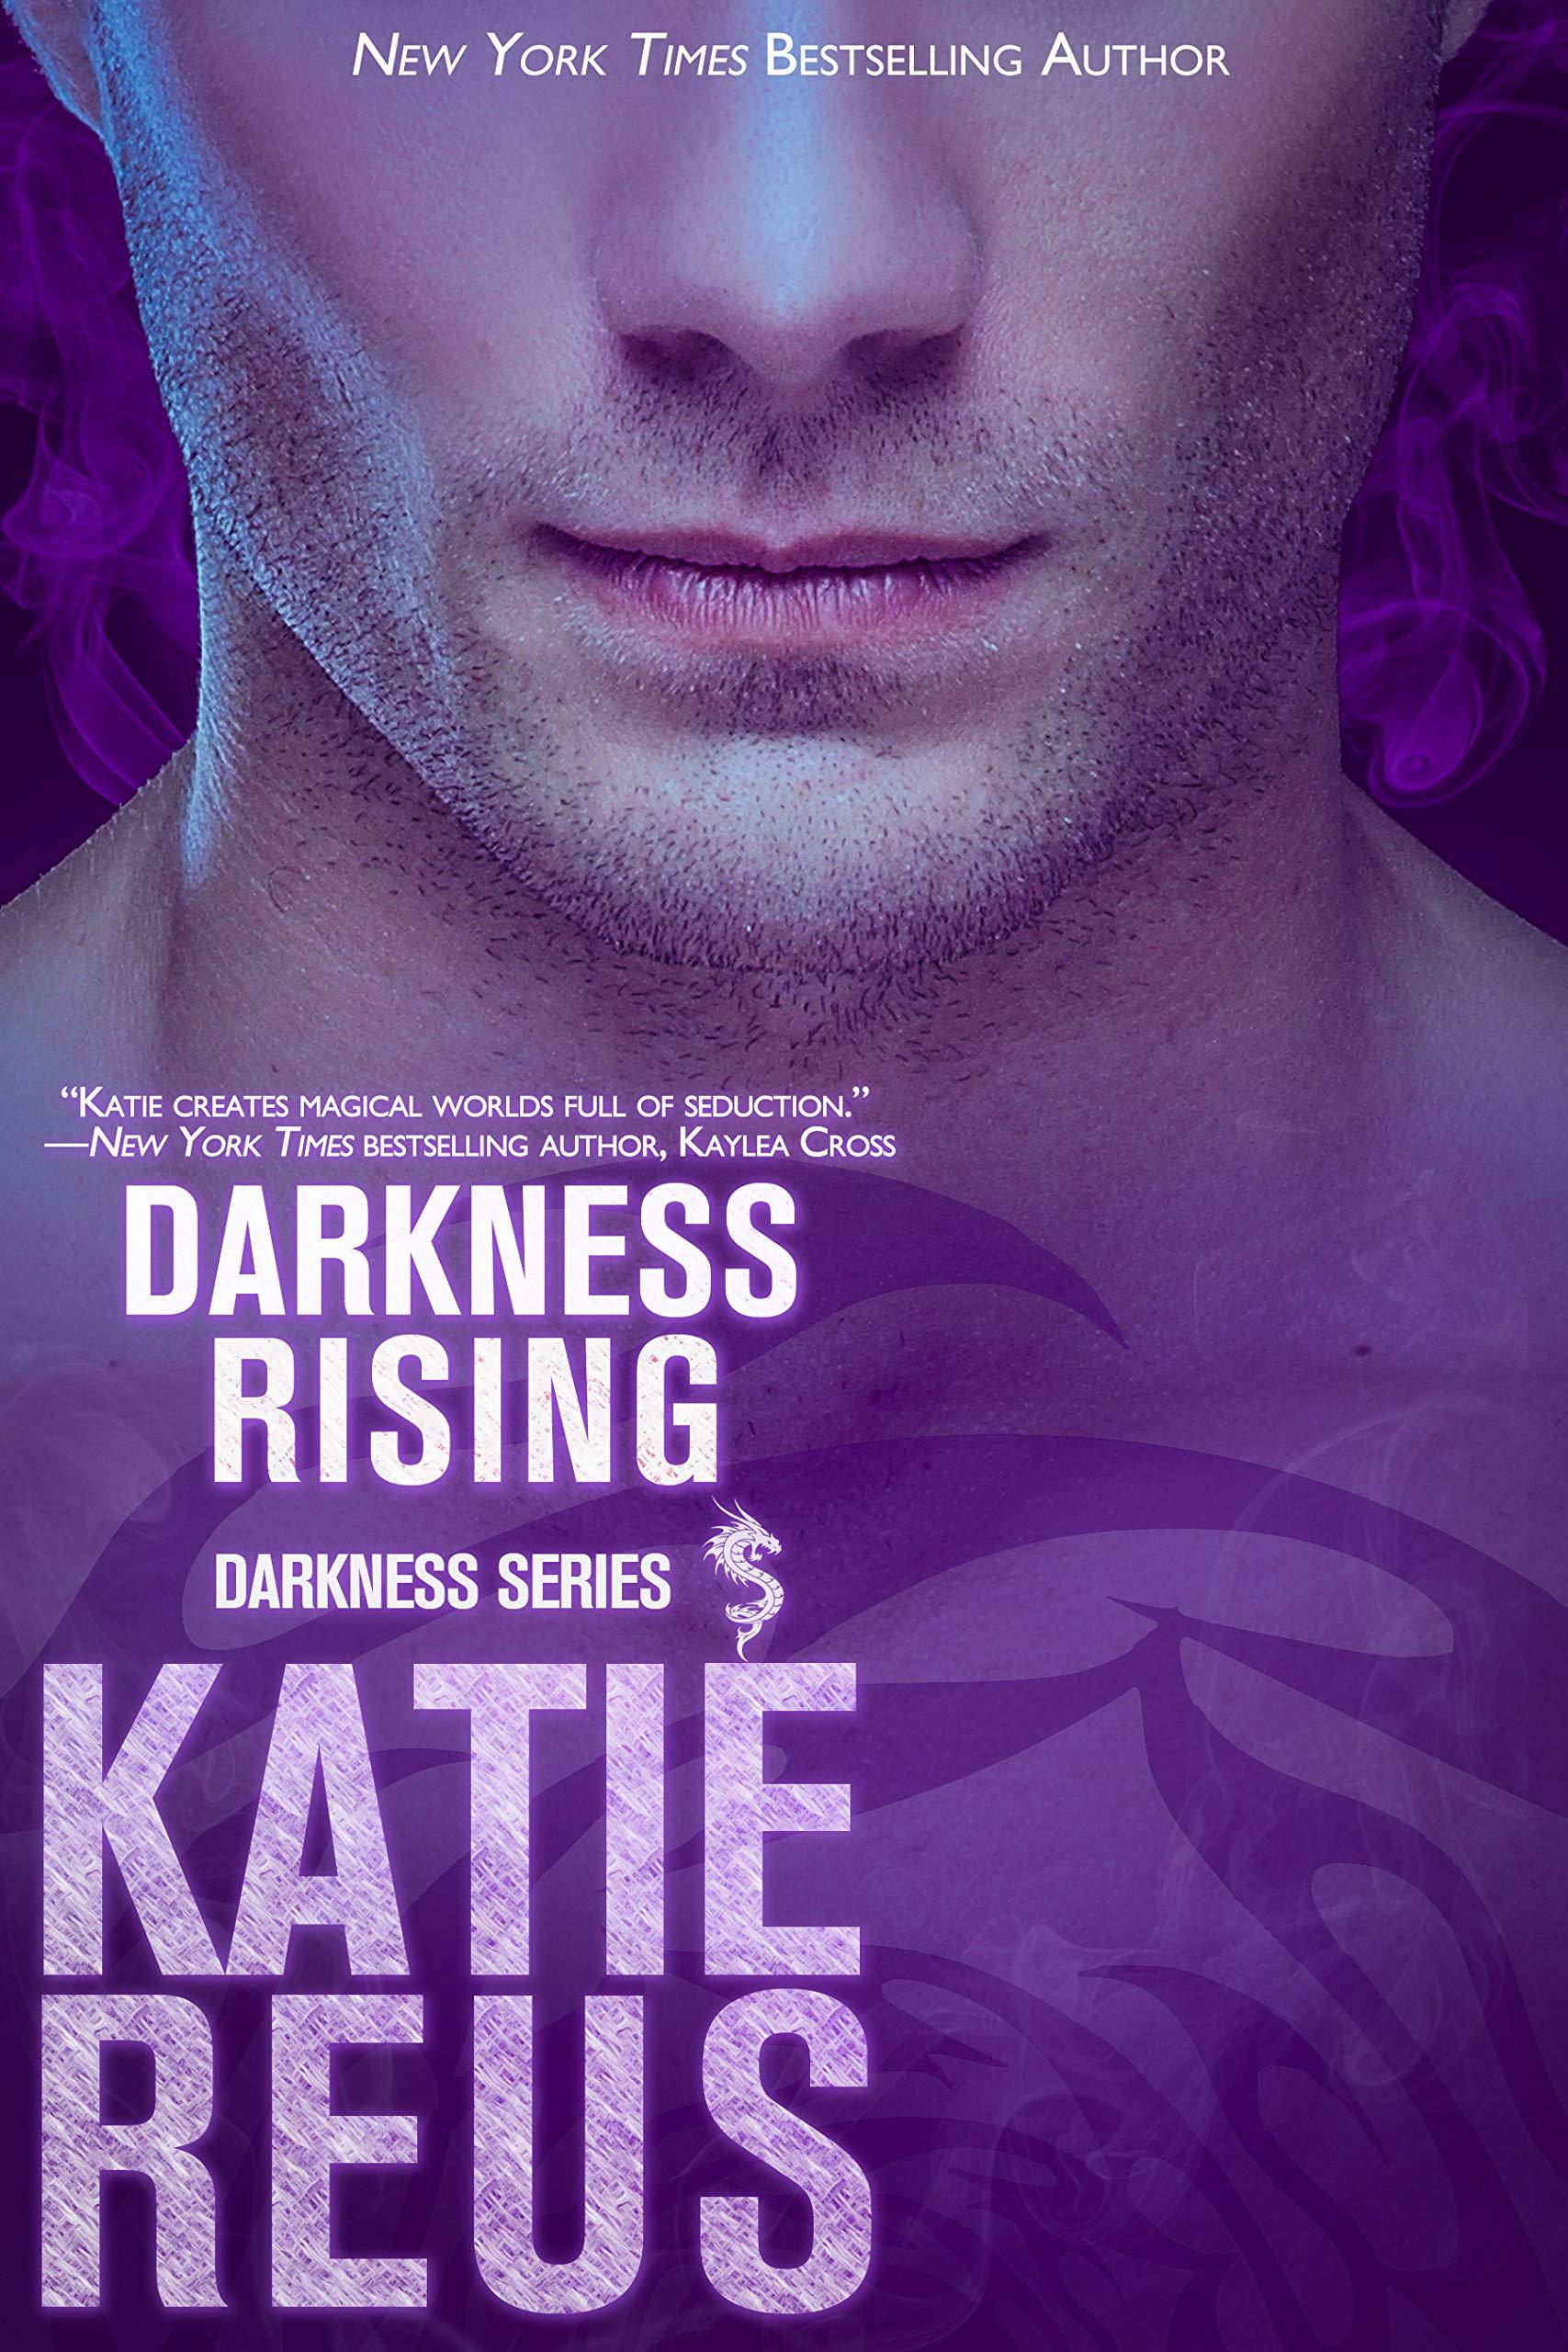 Amazon.com: Darkness Rising (Darkness Series) (9781635561128 ...